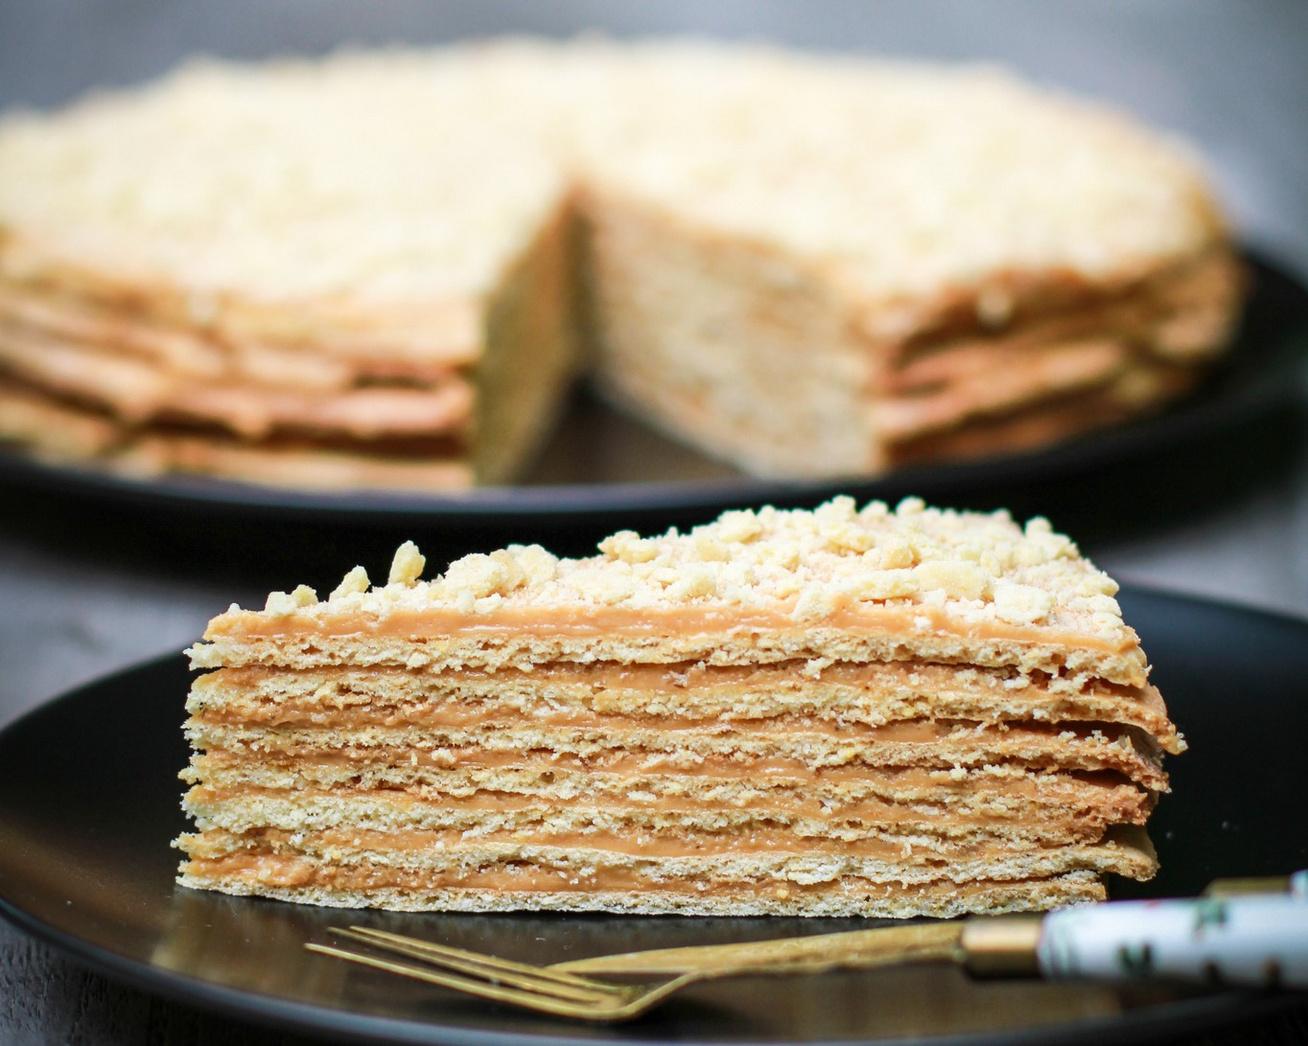 karamellkremes-marlenka-recept